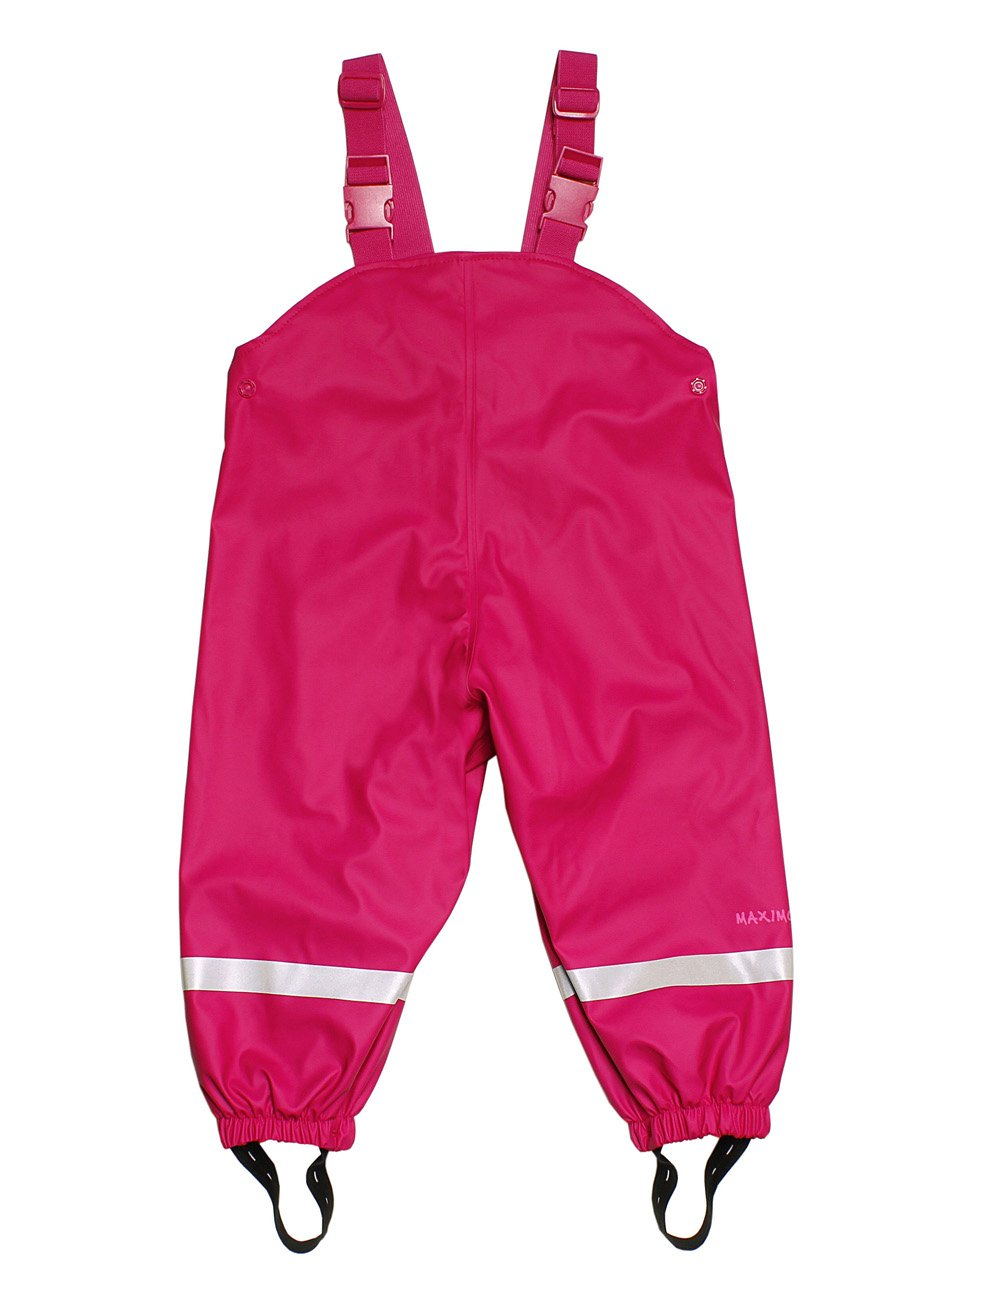 MaxiMo Regenhose Mädchen, Jerseyfutter, Pantaloni impermeabili per bambine e ragazze 46203-672100